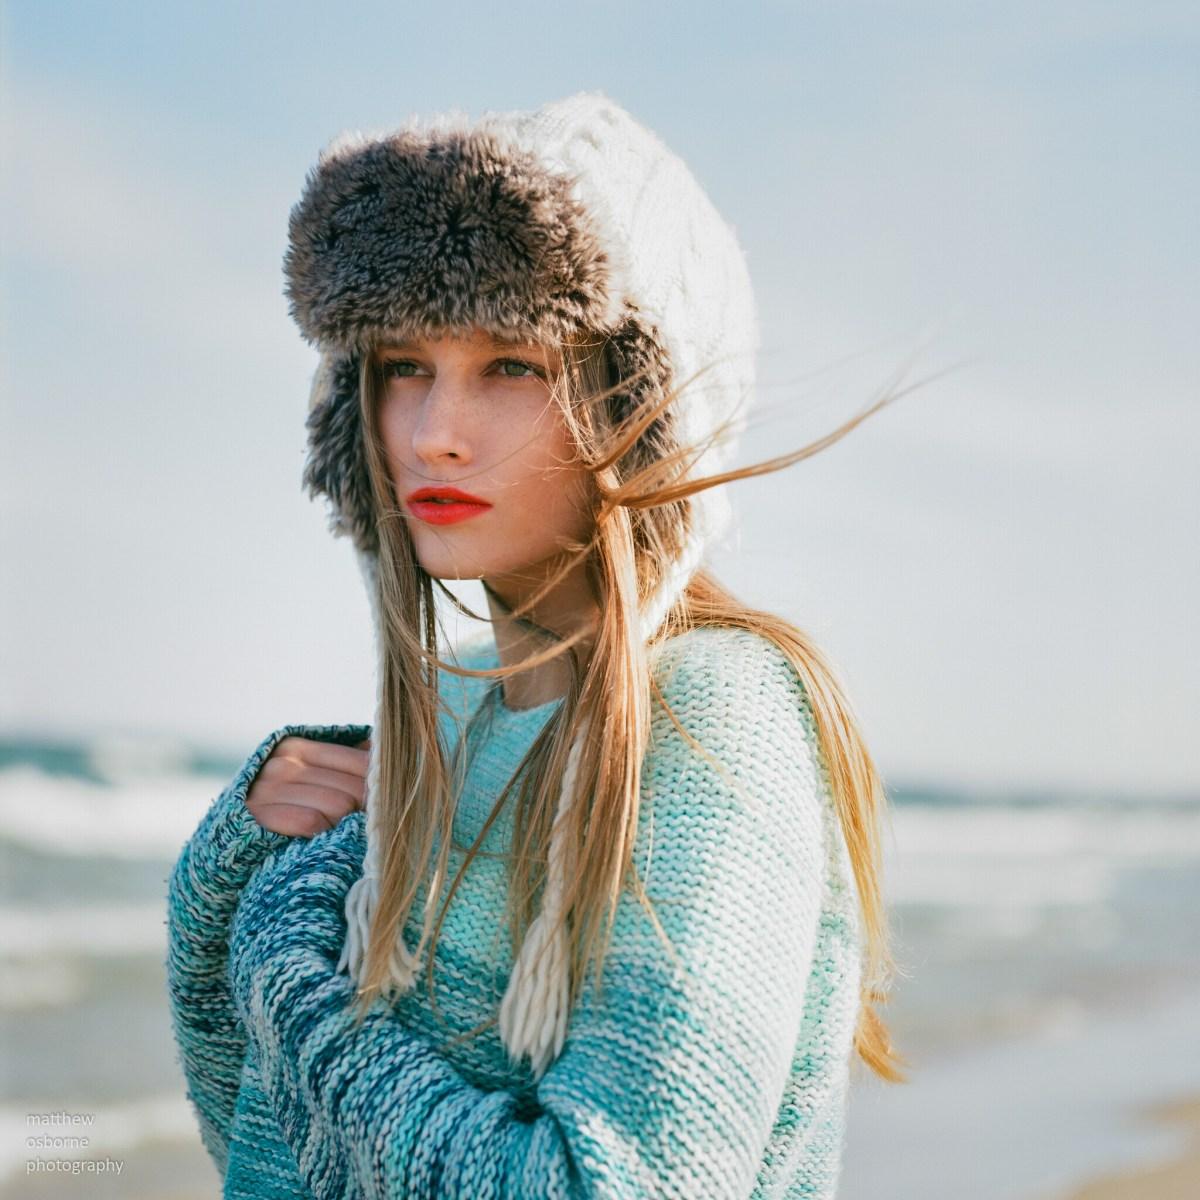 Kodak Ektar 100 Portraits / Hasselblad Fashion Shoot – Poland